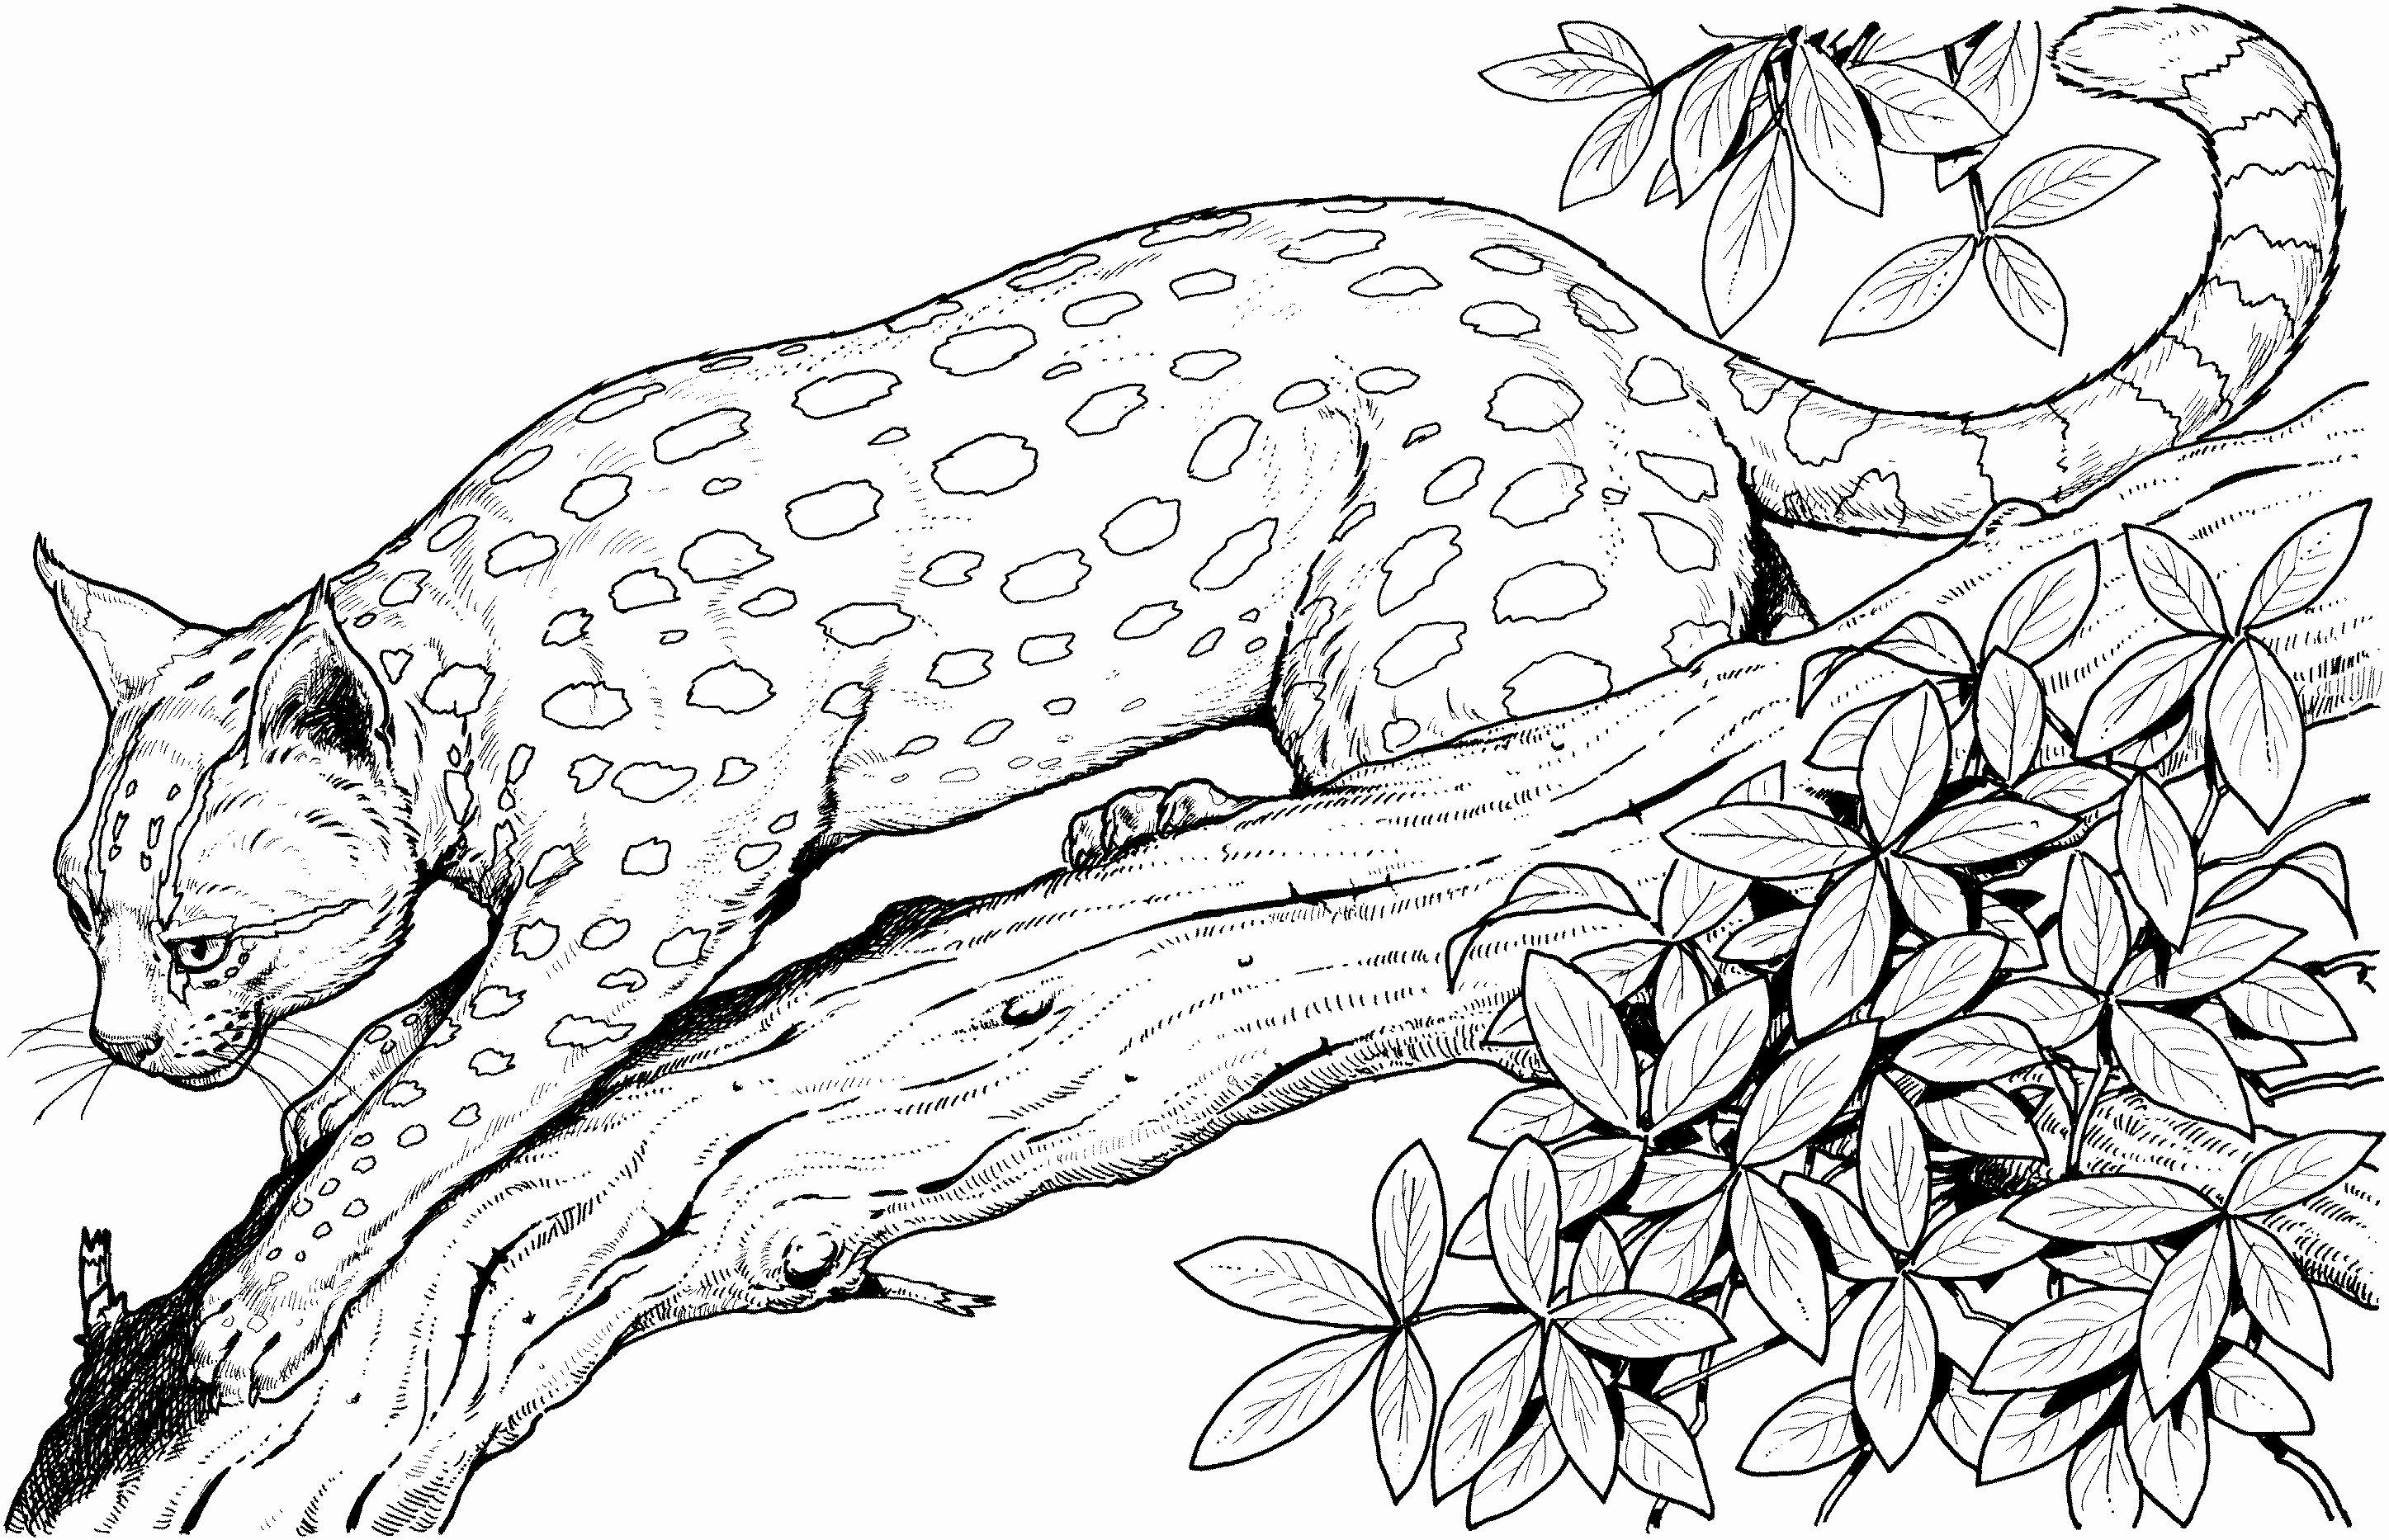 Cheetah Coloring Pages Elegant Cute Baby Cheetah Coloring Pages Coloring Home Jungle Coloring Pages Cat Coloring Page Animal Coloring Pages